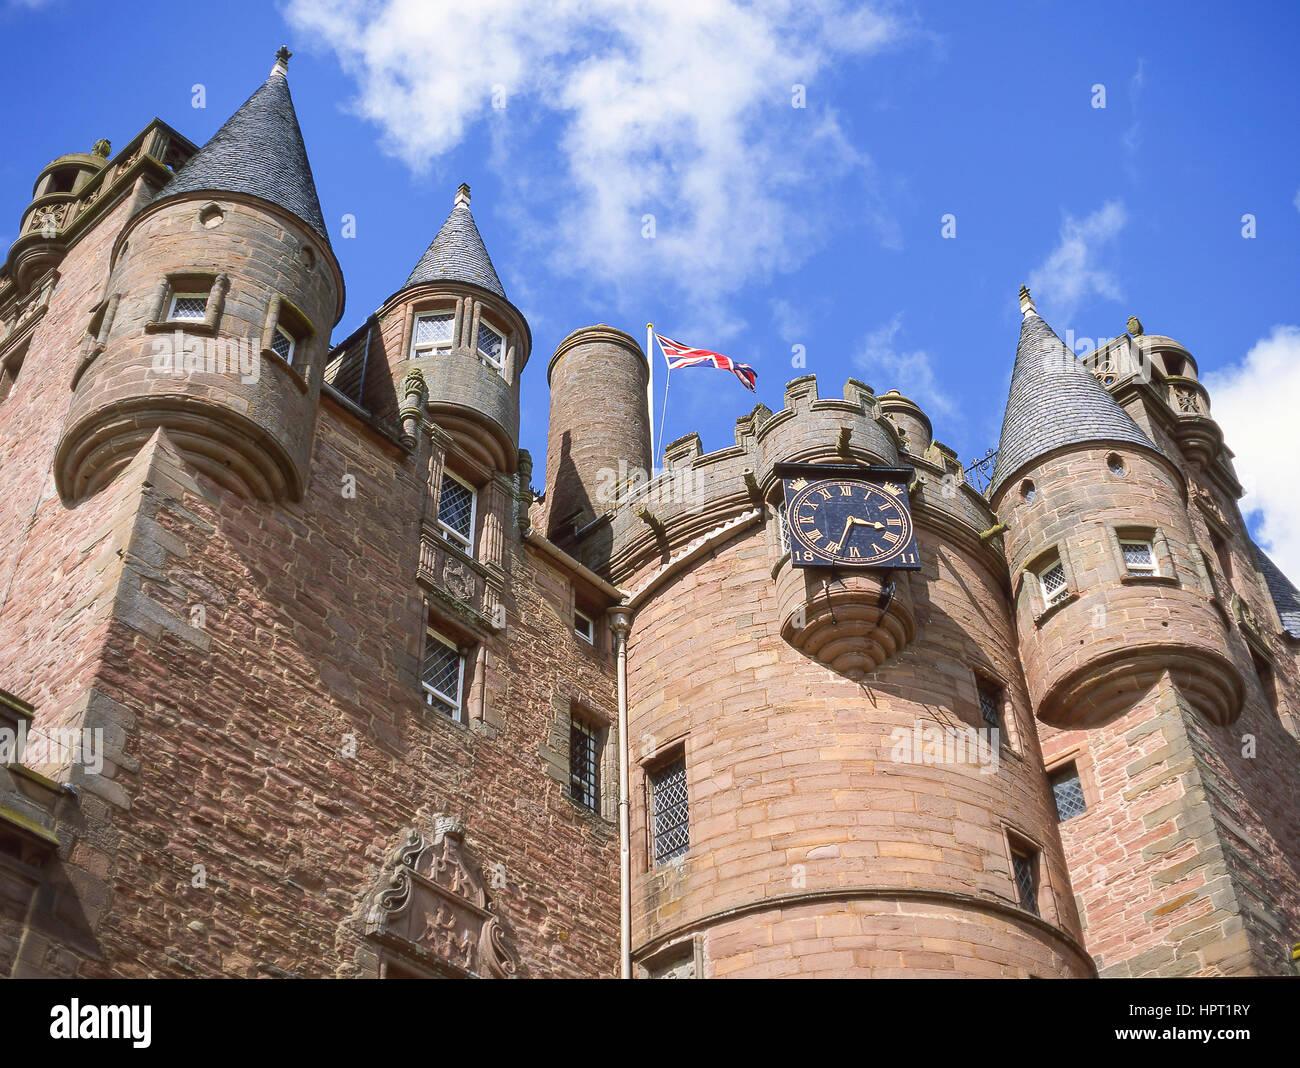 17th century Glamis Castle, Glamis, Angus, Scotland, United Kingdom - Stock Image